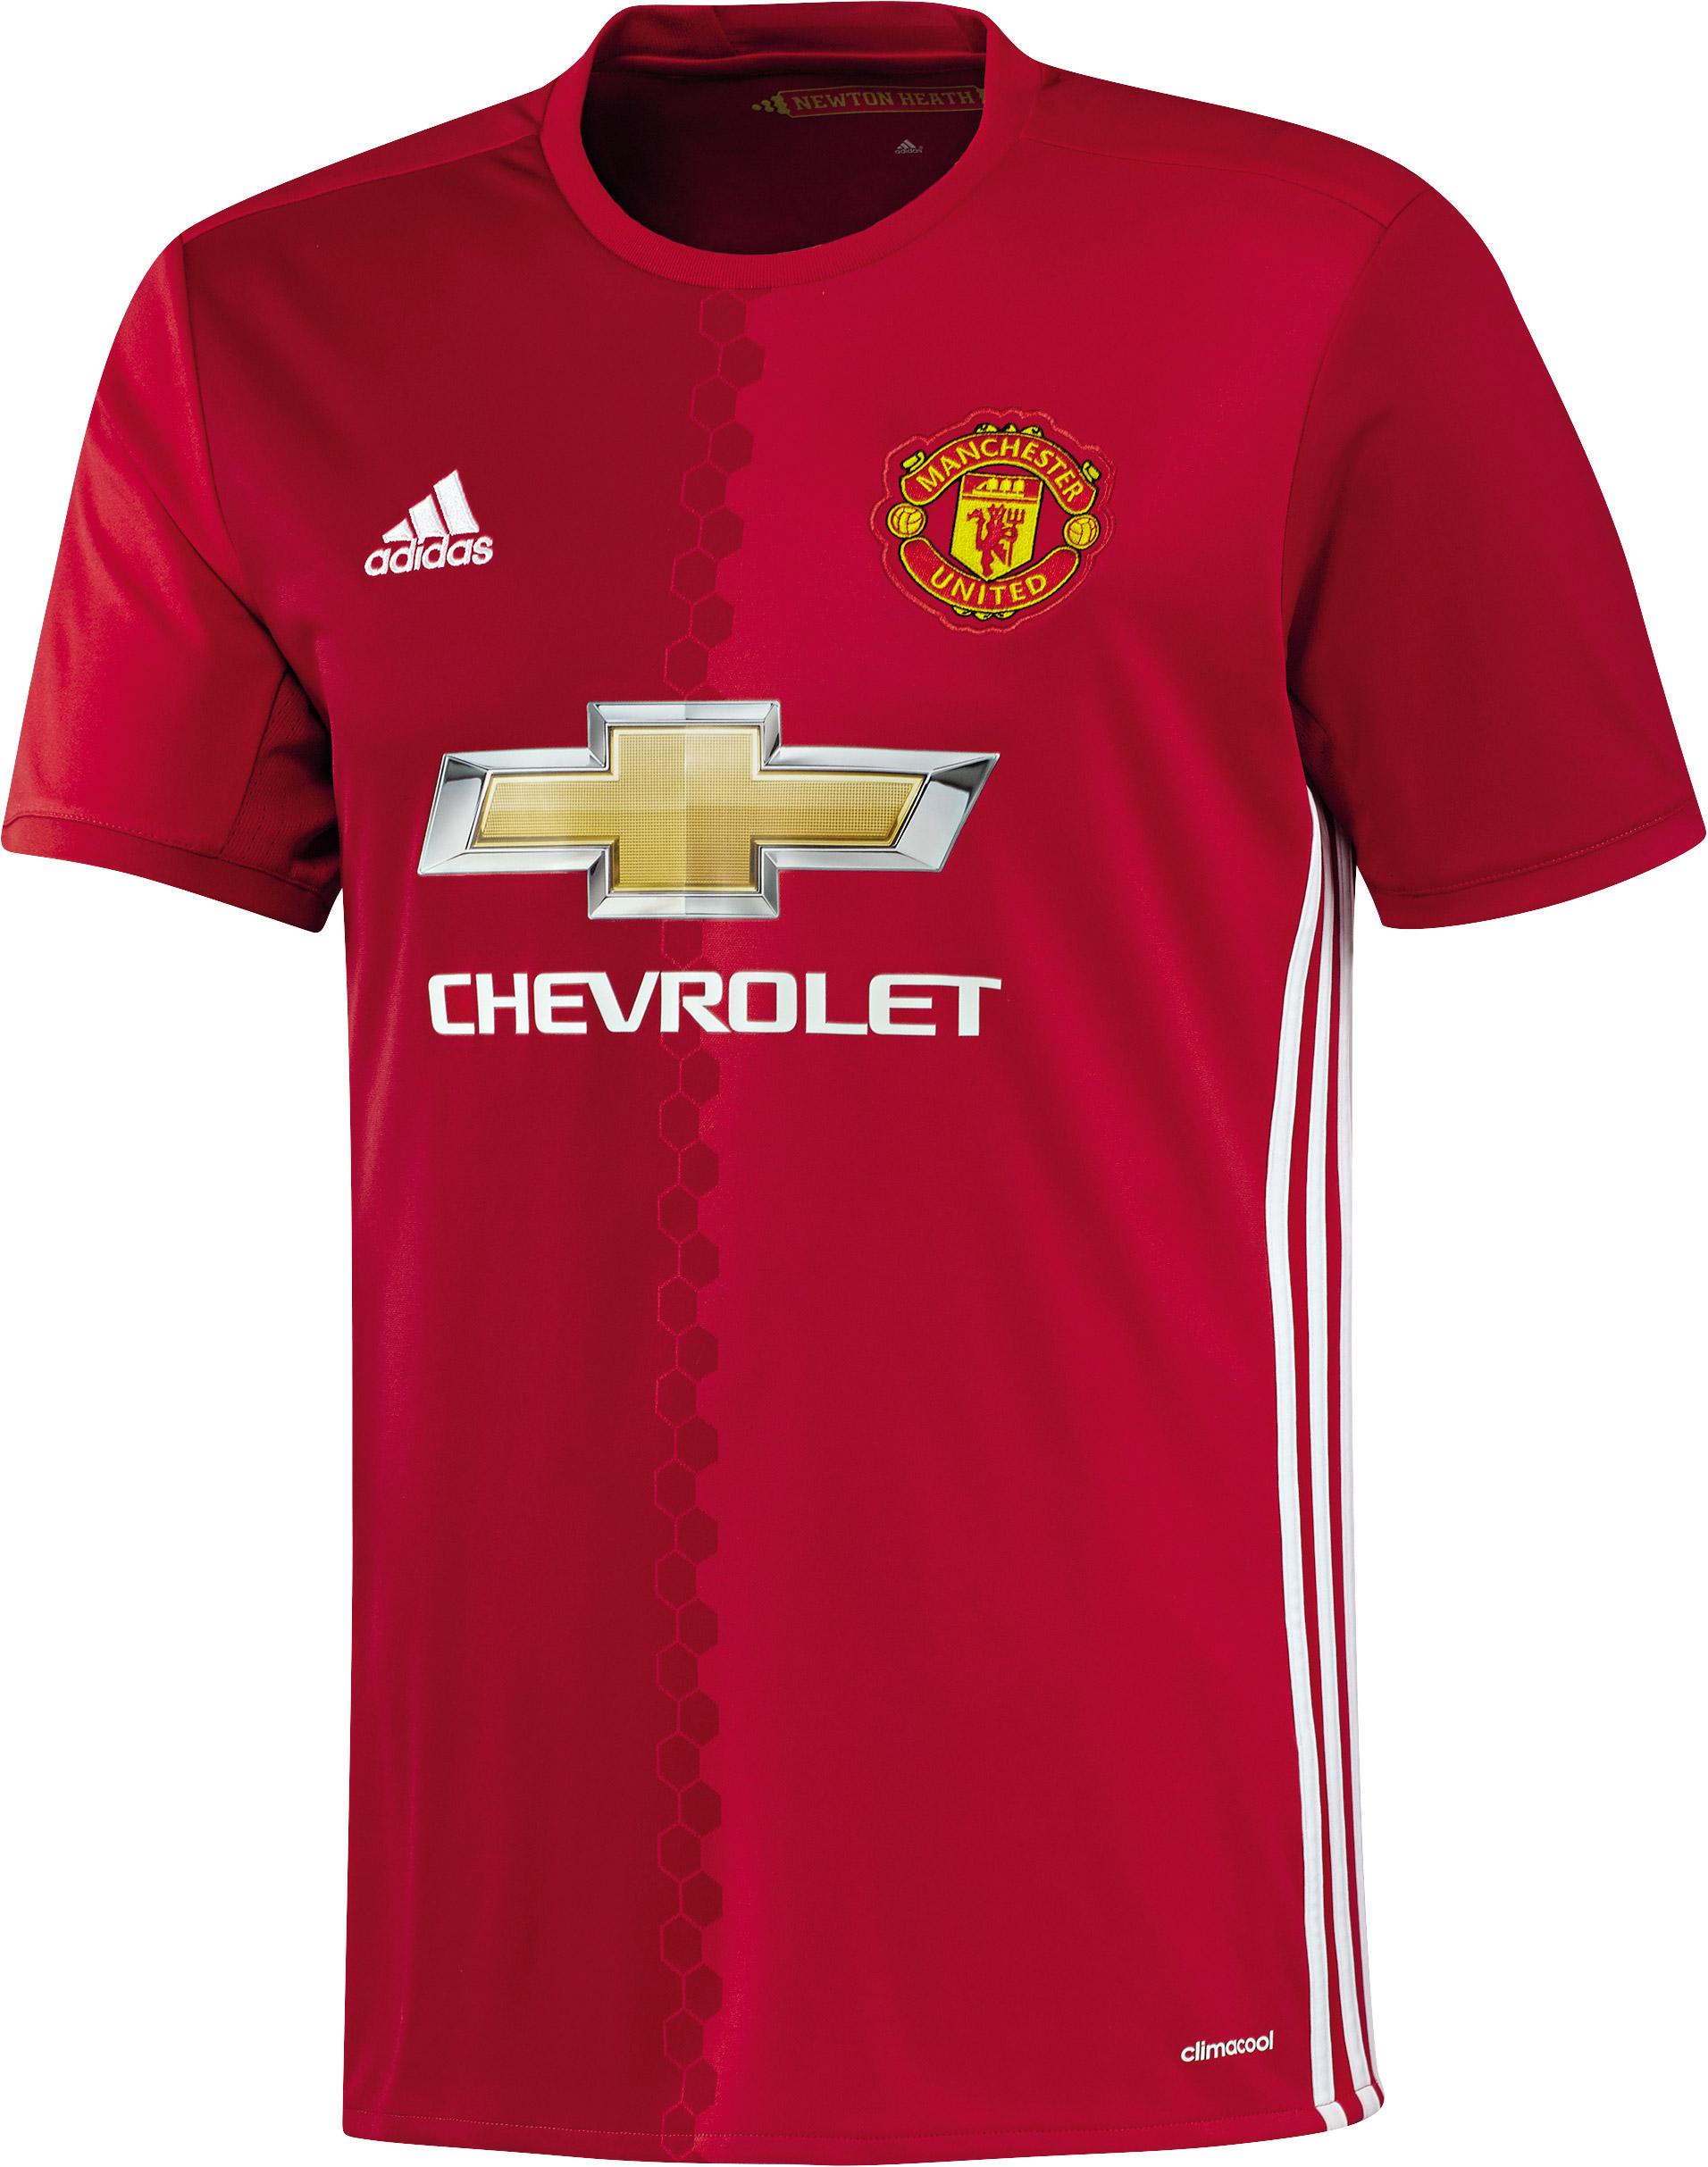 Herren Trikot Manchester United Home Jersey, REARED/POWRED/WHITE, M